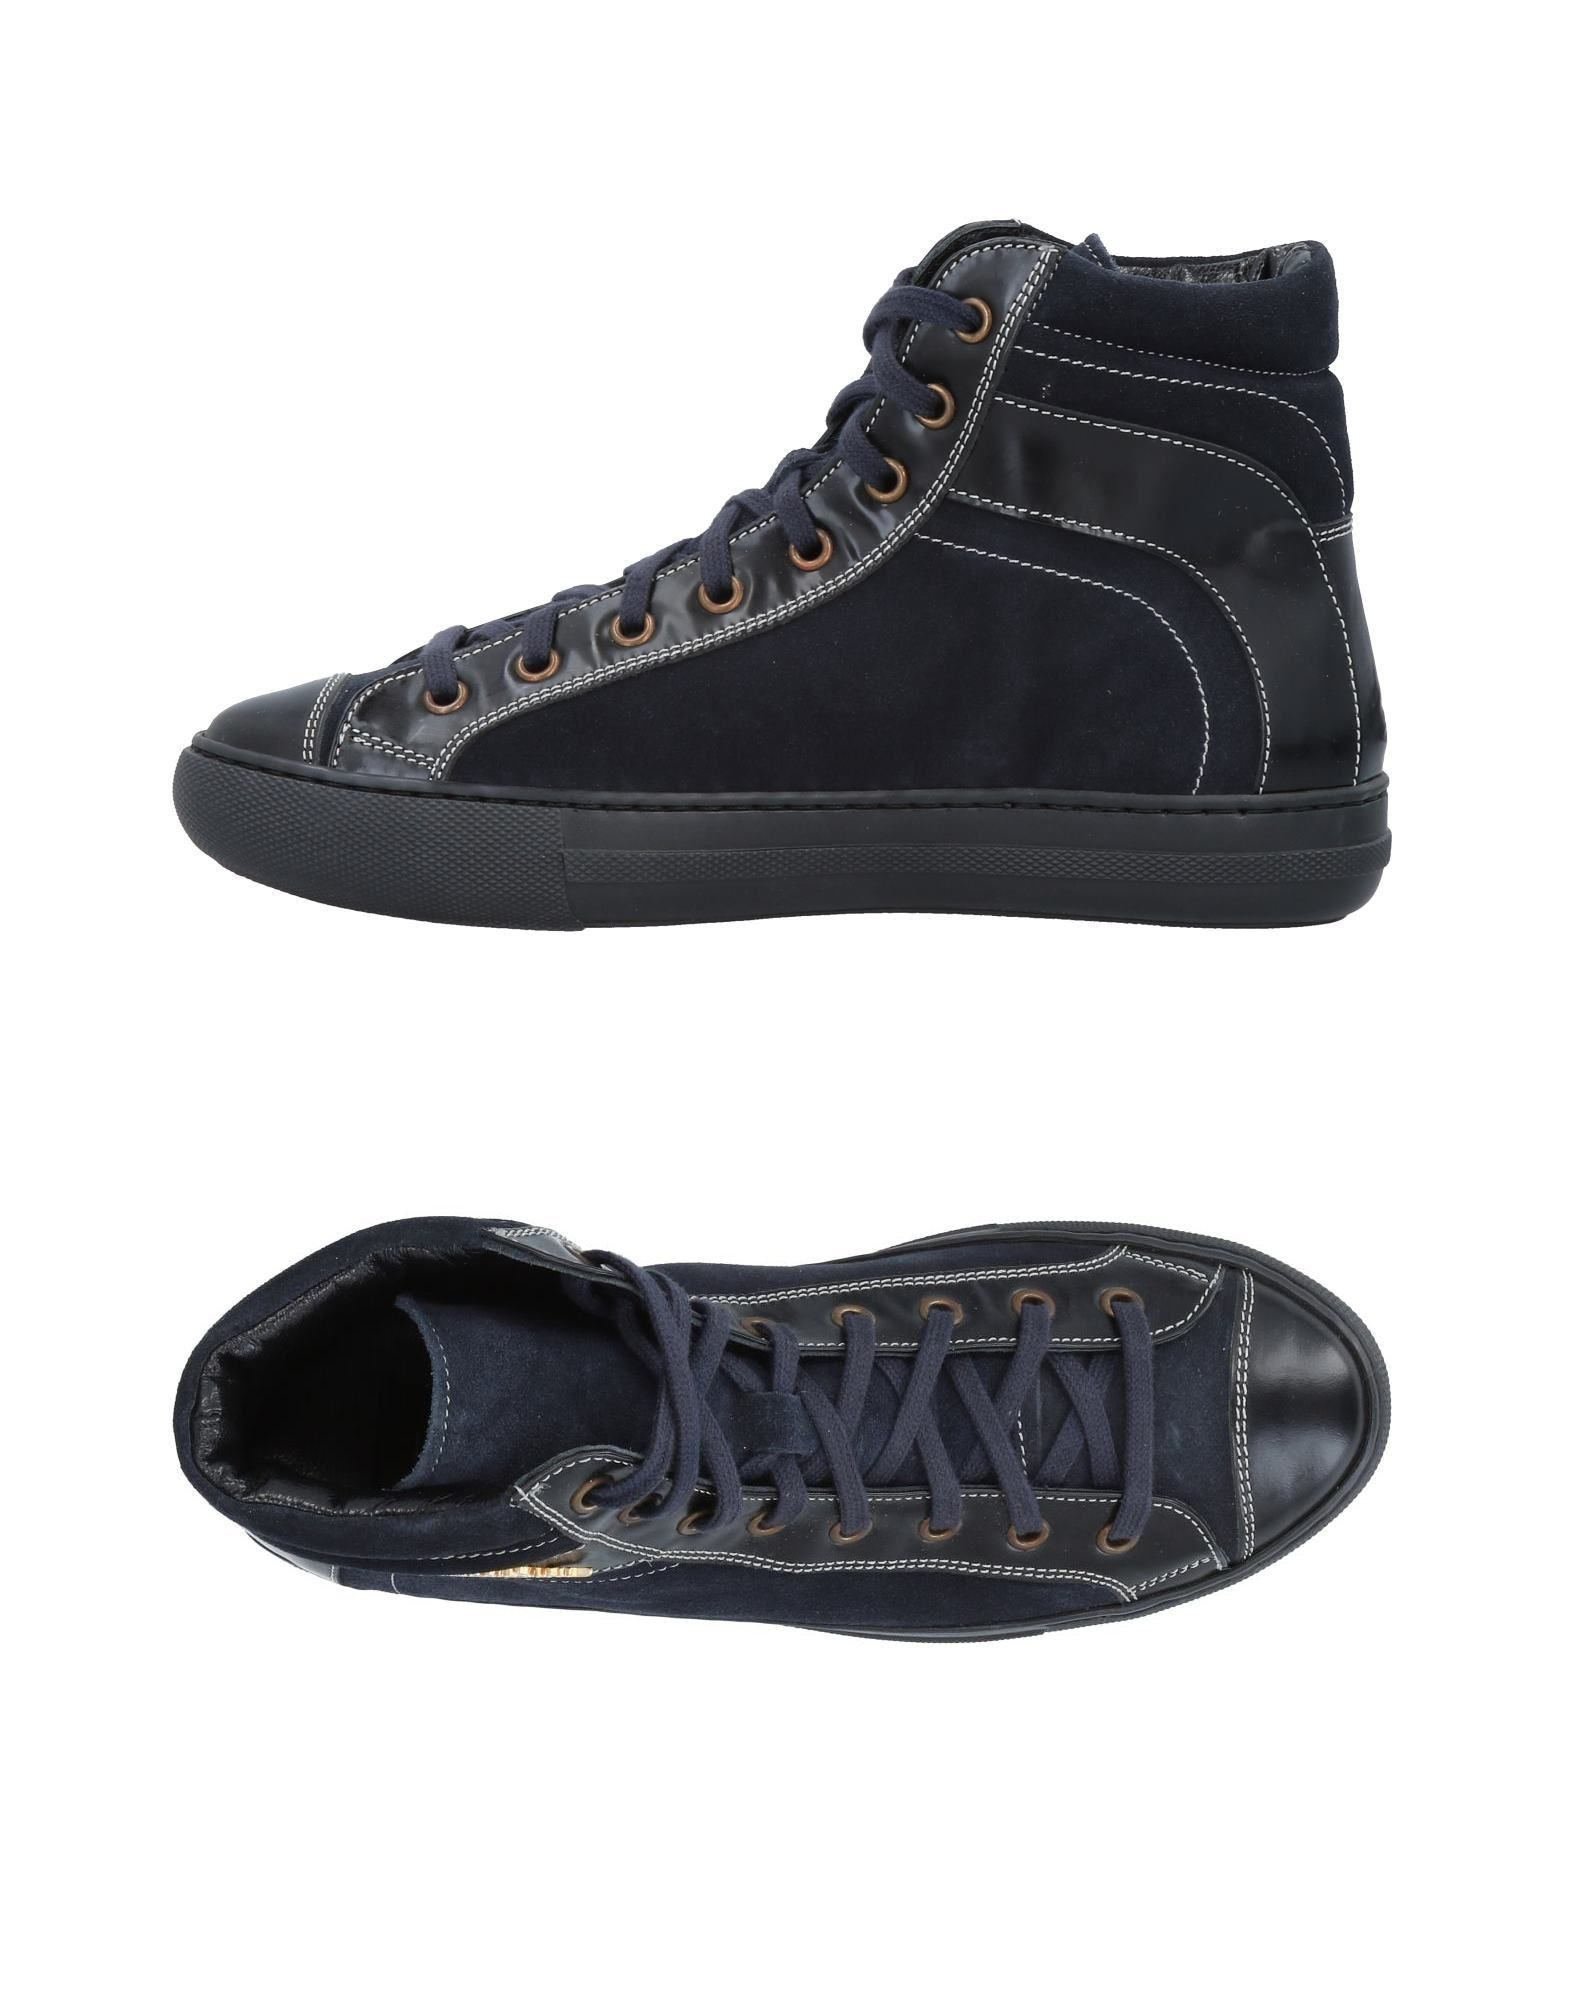 Moda Sneakers Braccialini Donna - 11485300UX